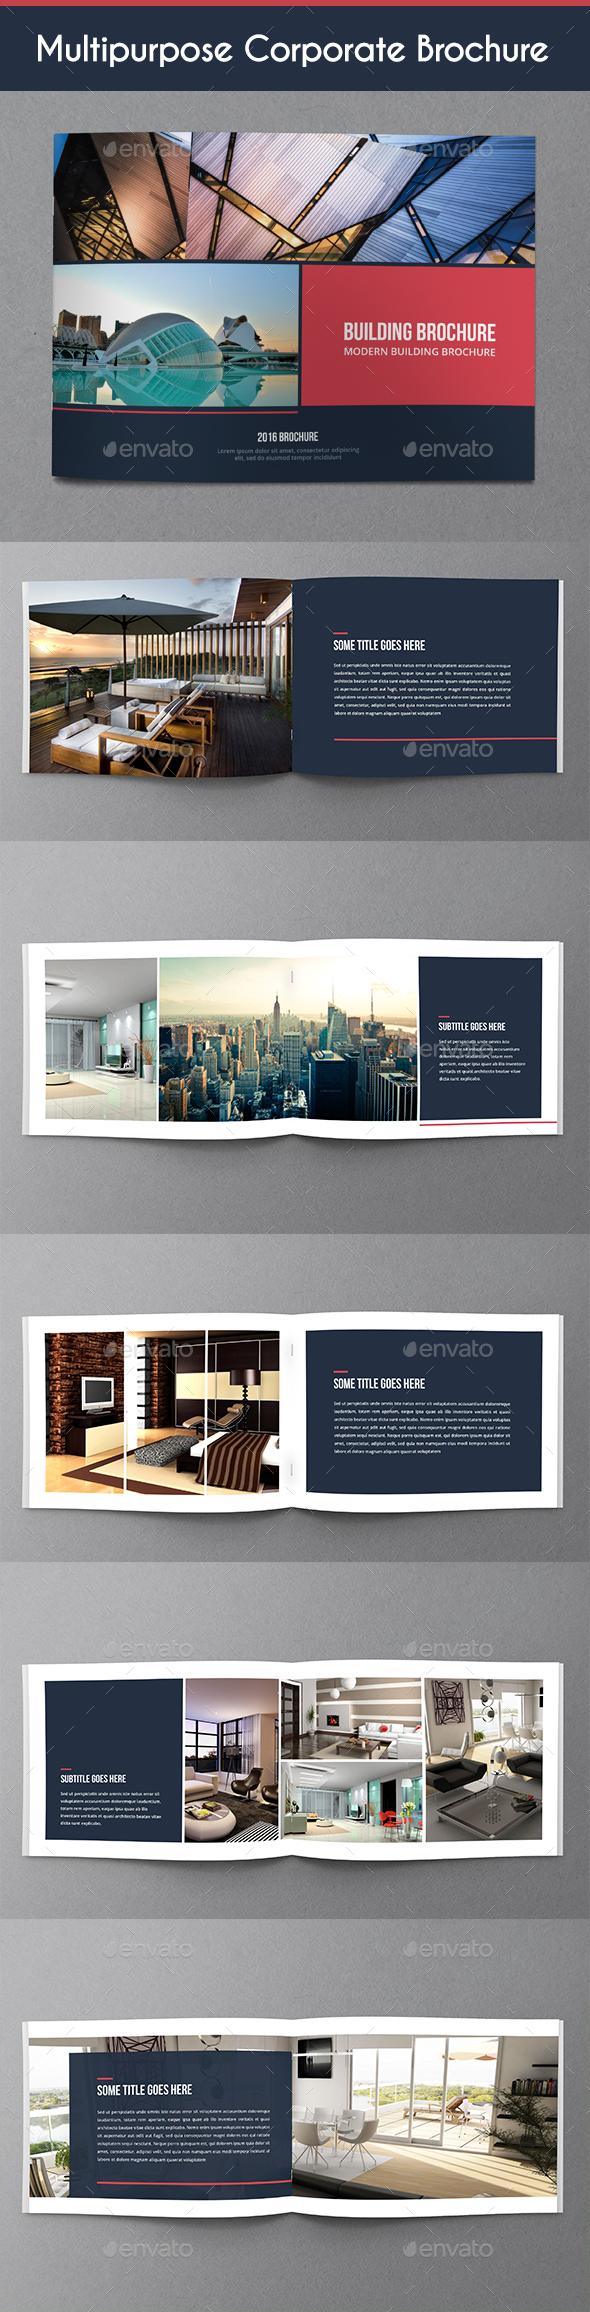 Multipurpose Corporate Brochure - Corporate Brochures